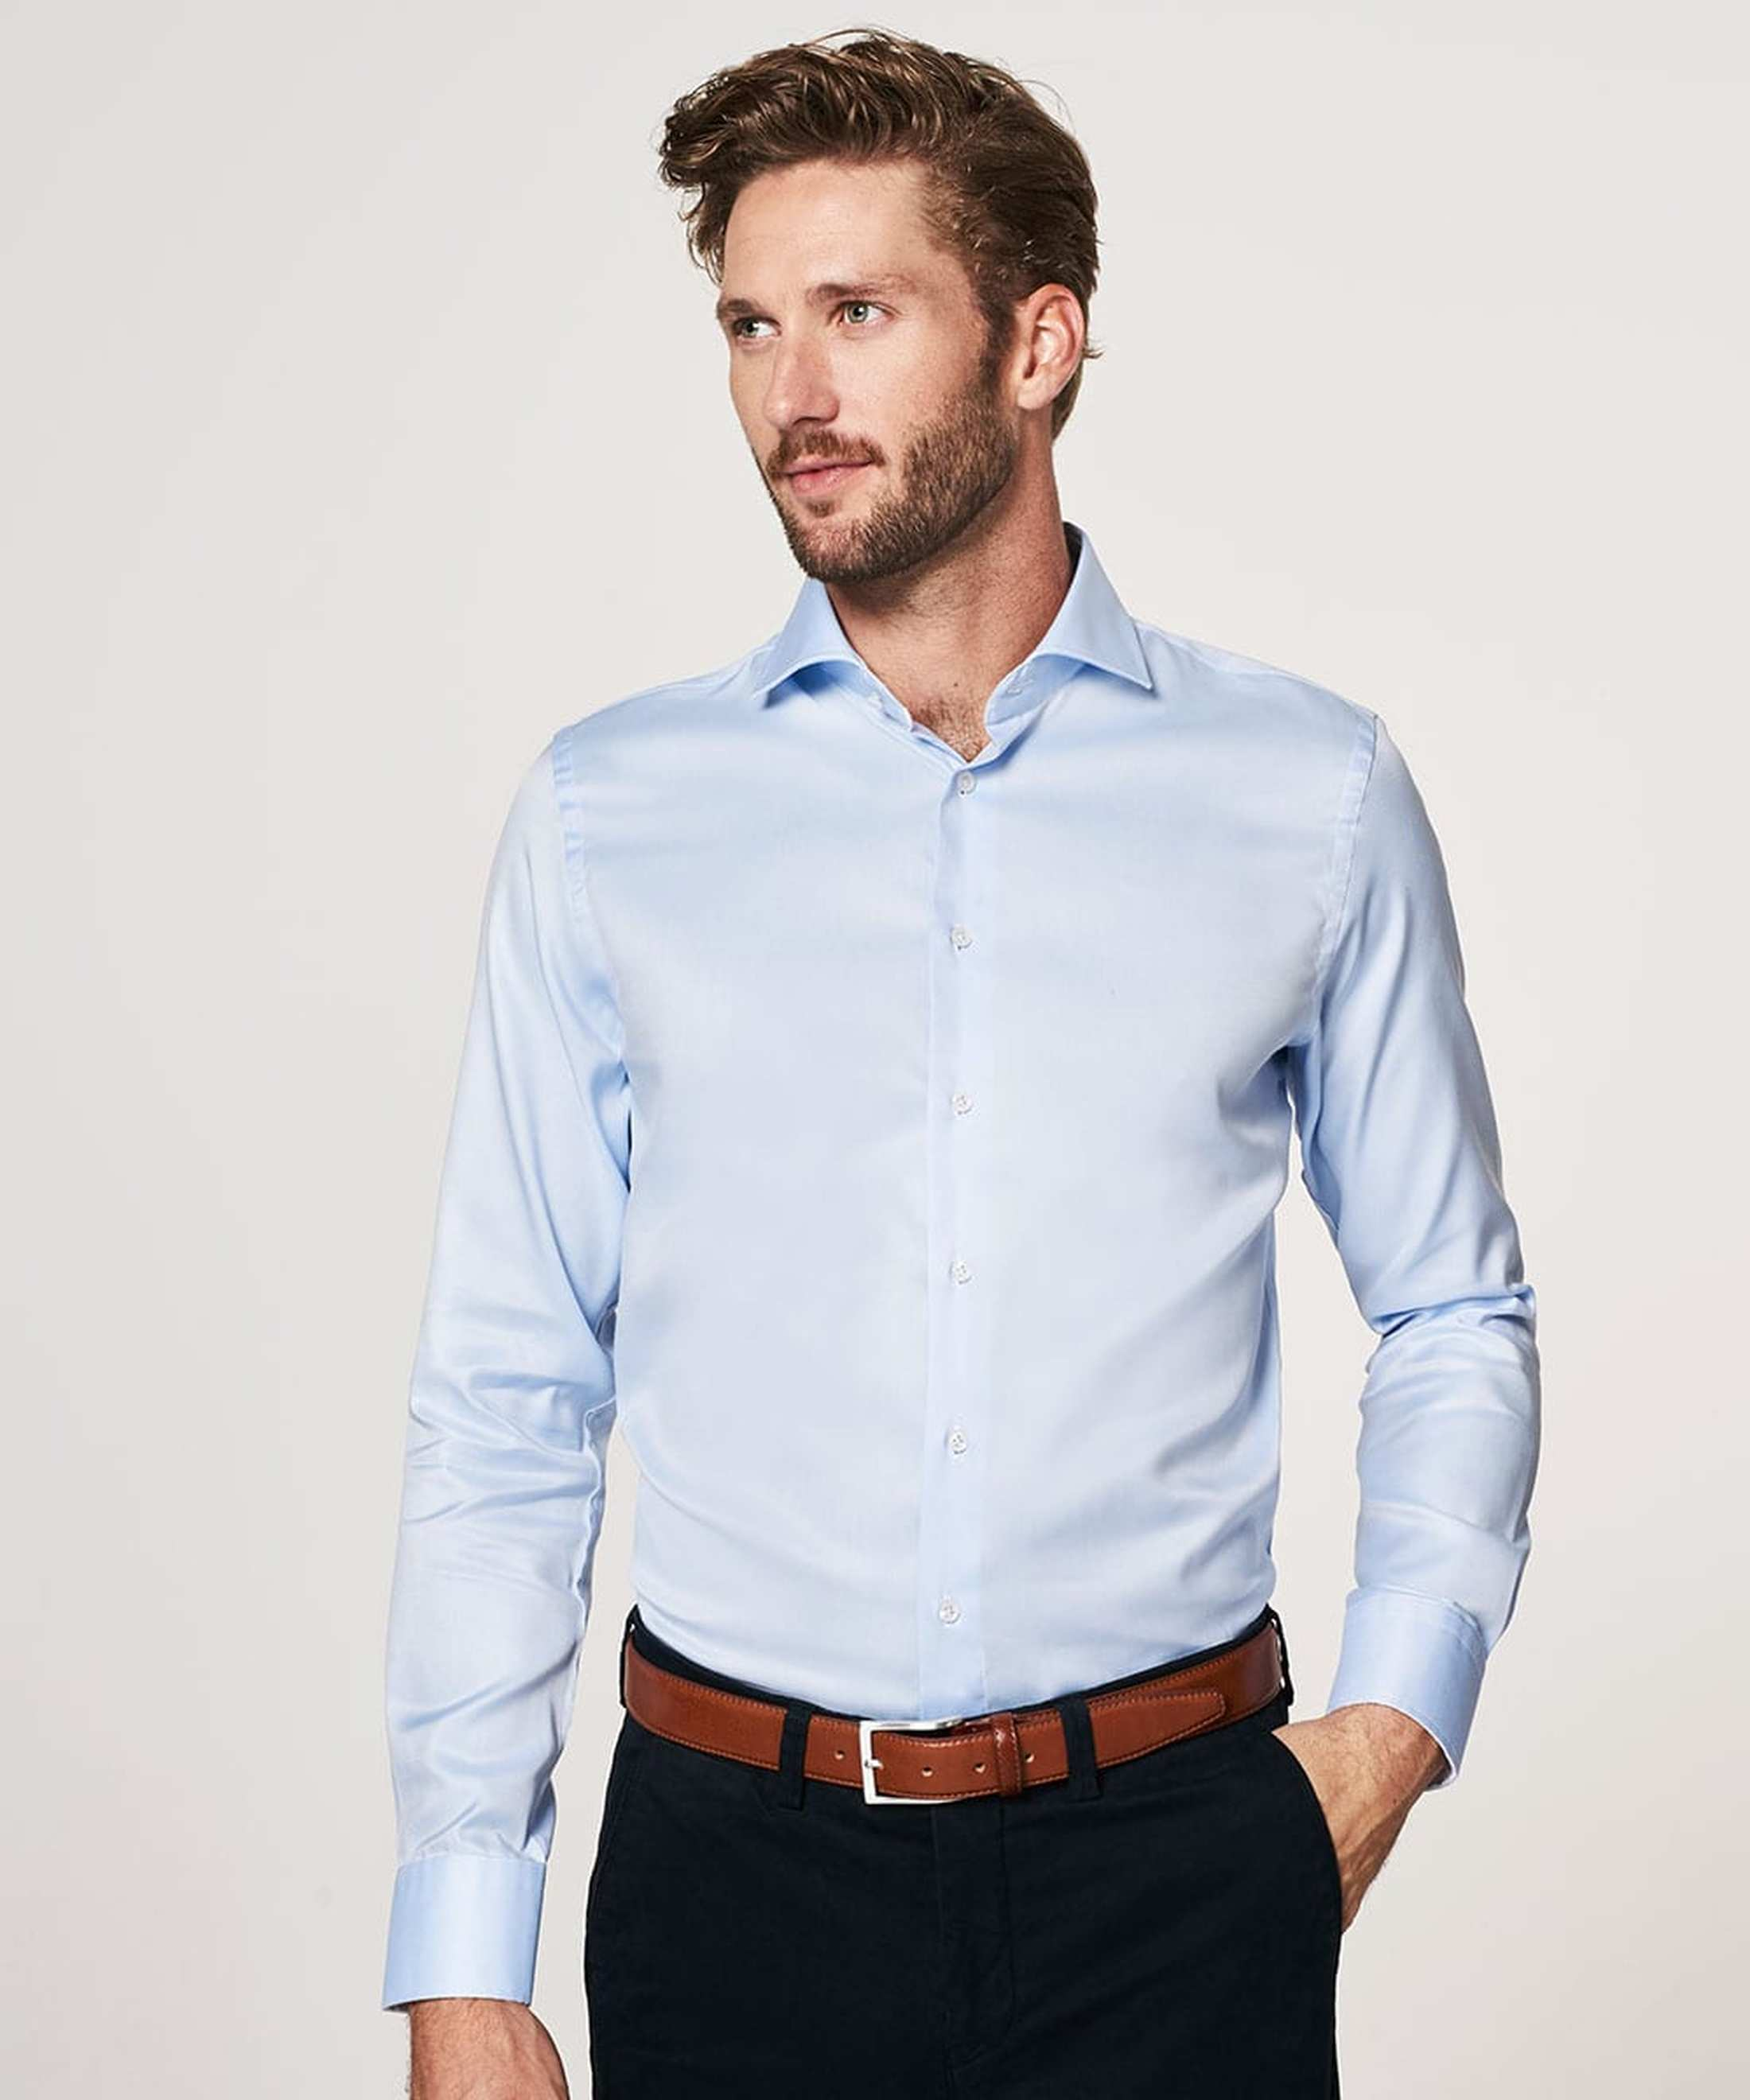 Profuomo Overhemd Blauw + Wit Contrast foto 3